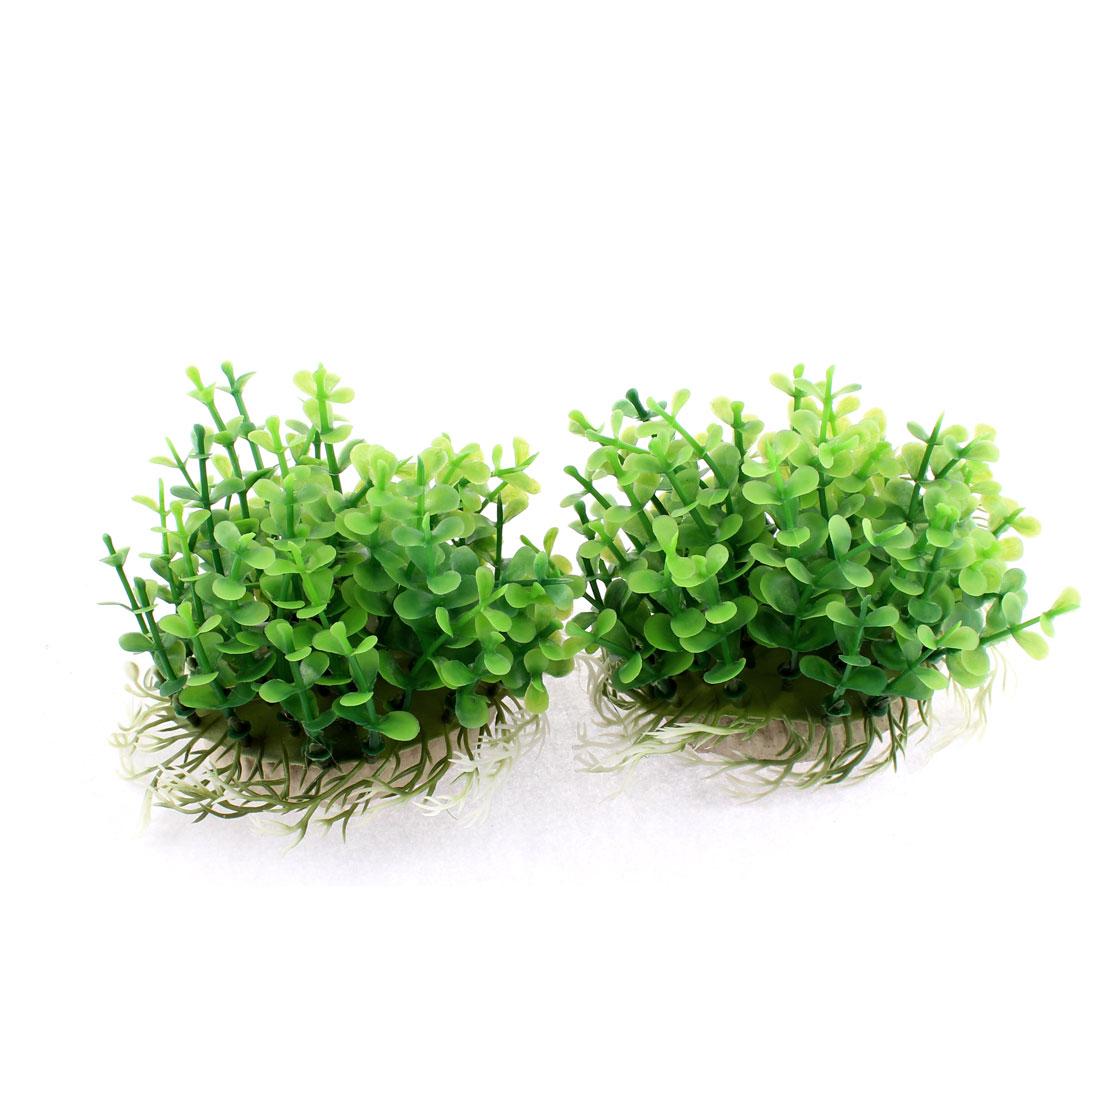 Aquarium Fish Tank Artificial Water Plant Grass Decor Green 9cm Height